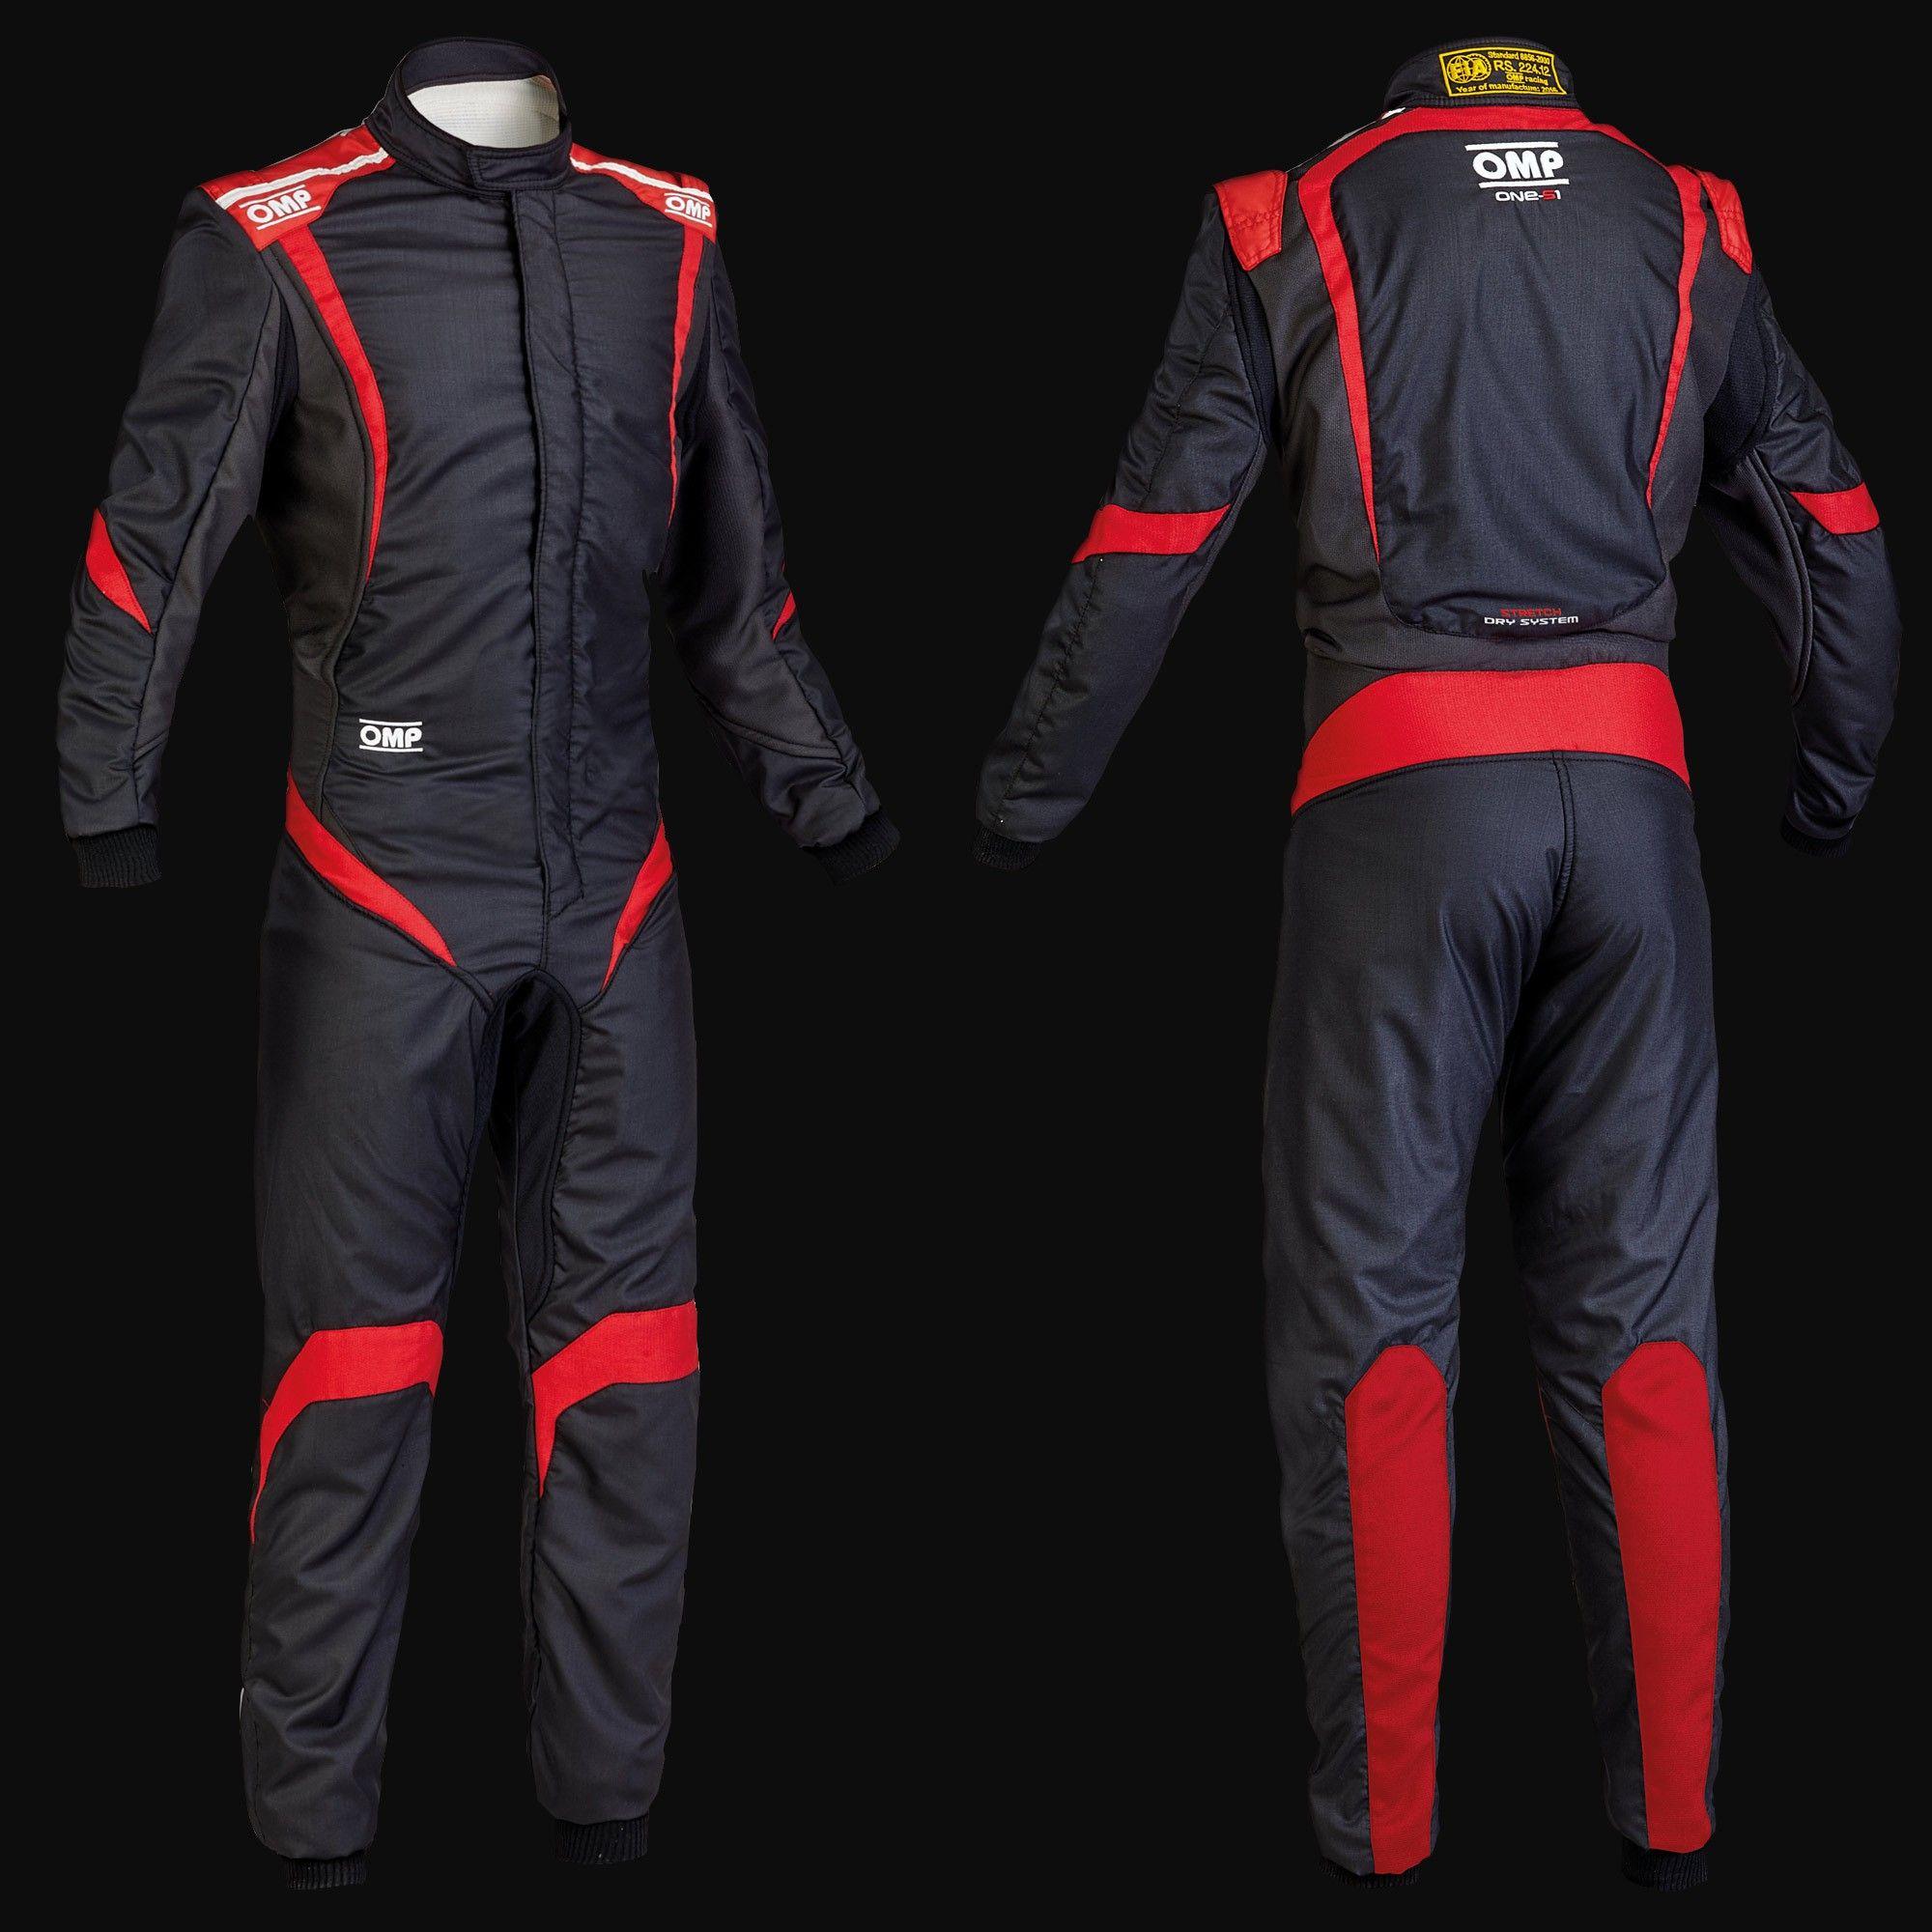 One S1 Suit Work Coveralls Racing Suit Flight Suits